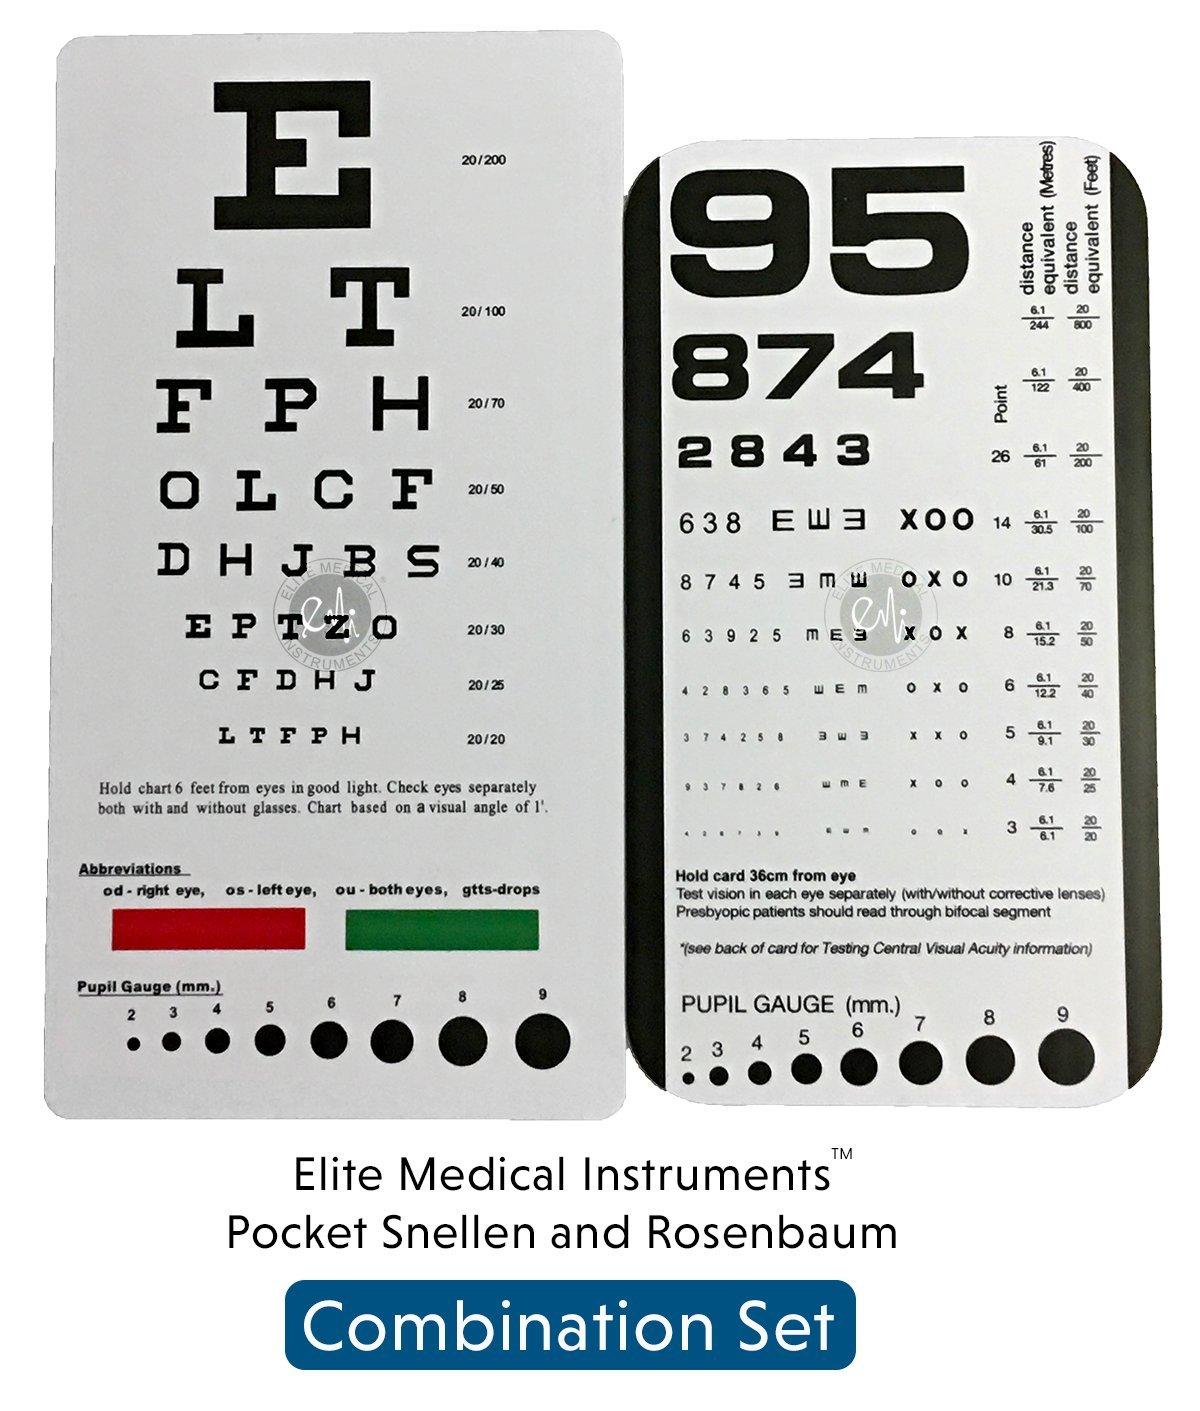 Amazon emi rosenbaum and snellen pocket eye charts 2 pack amazon emi rosenbaum and snellen pocket eye charts 2 pack health personal care nvjuhfo Images